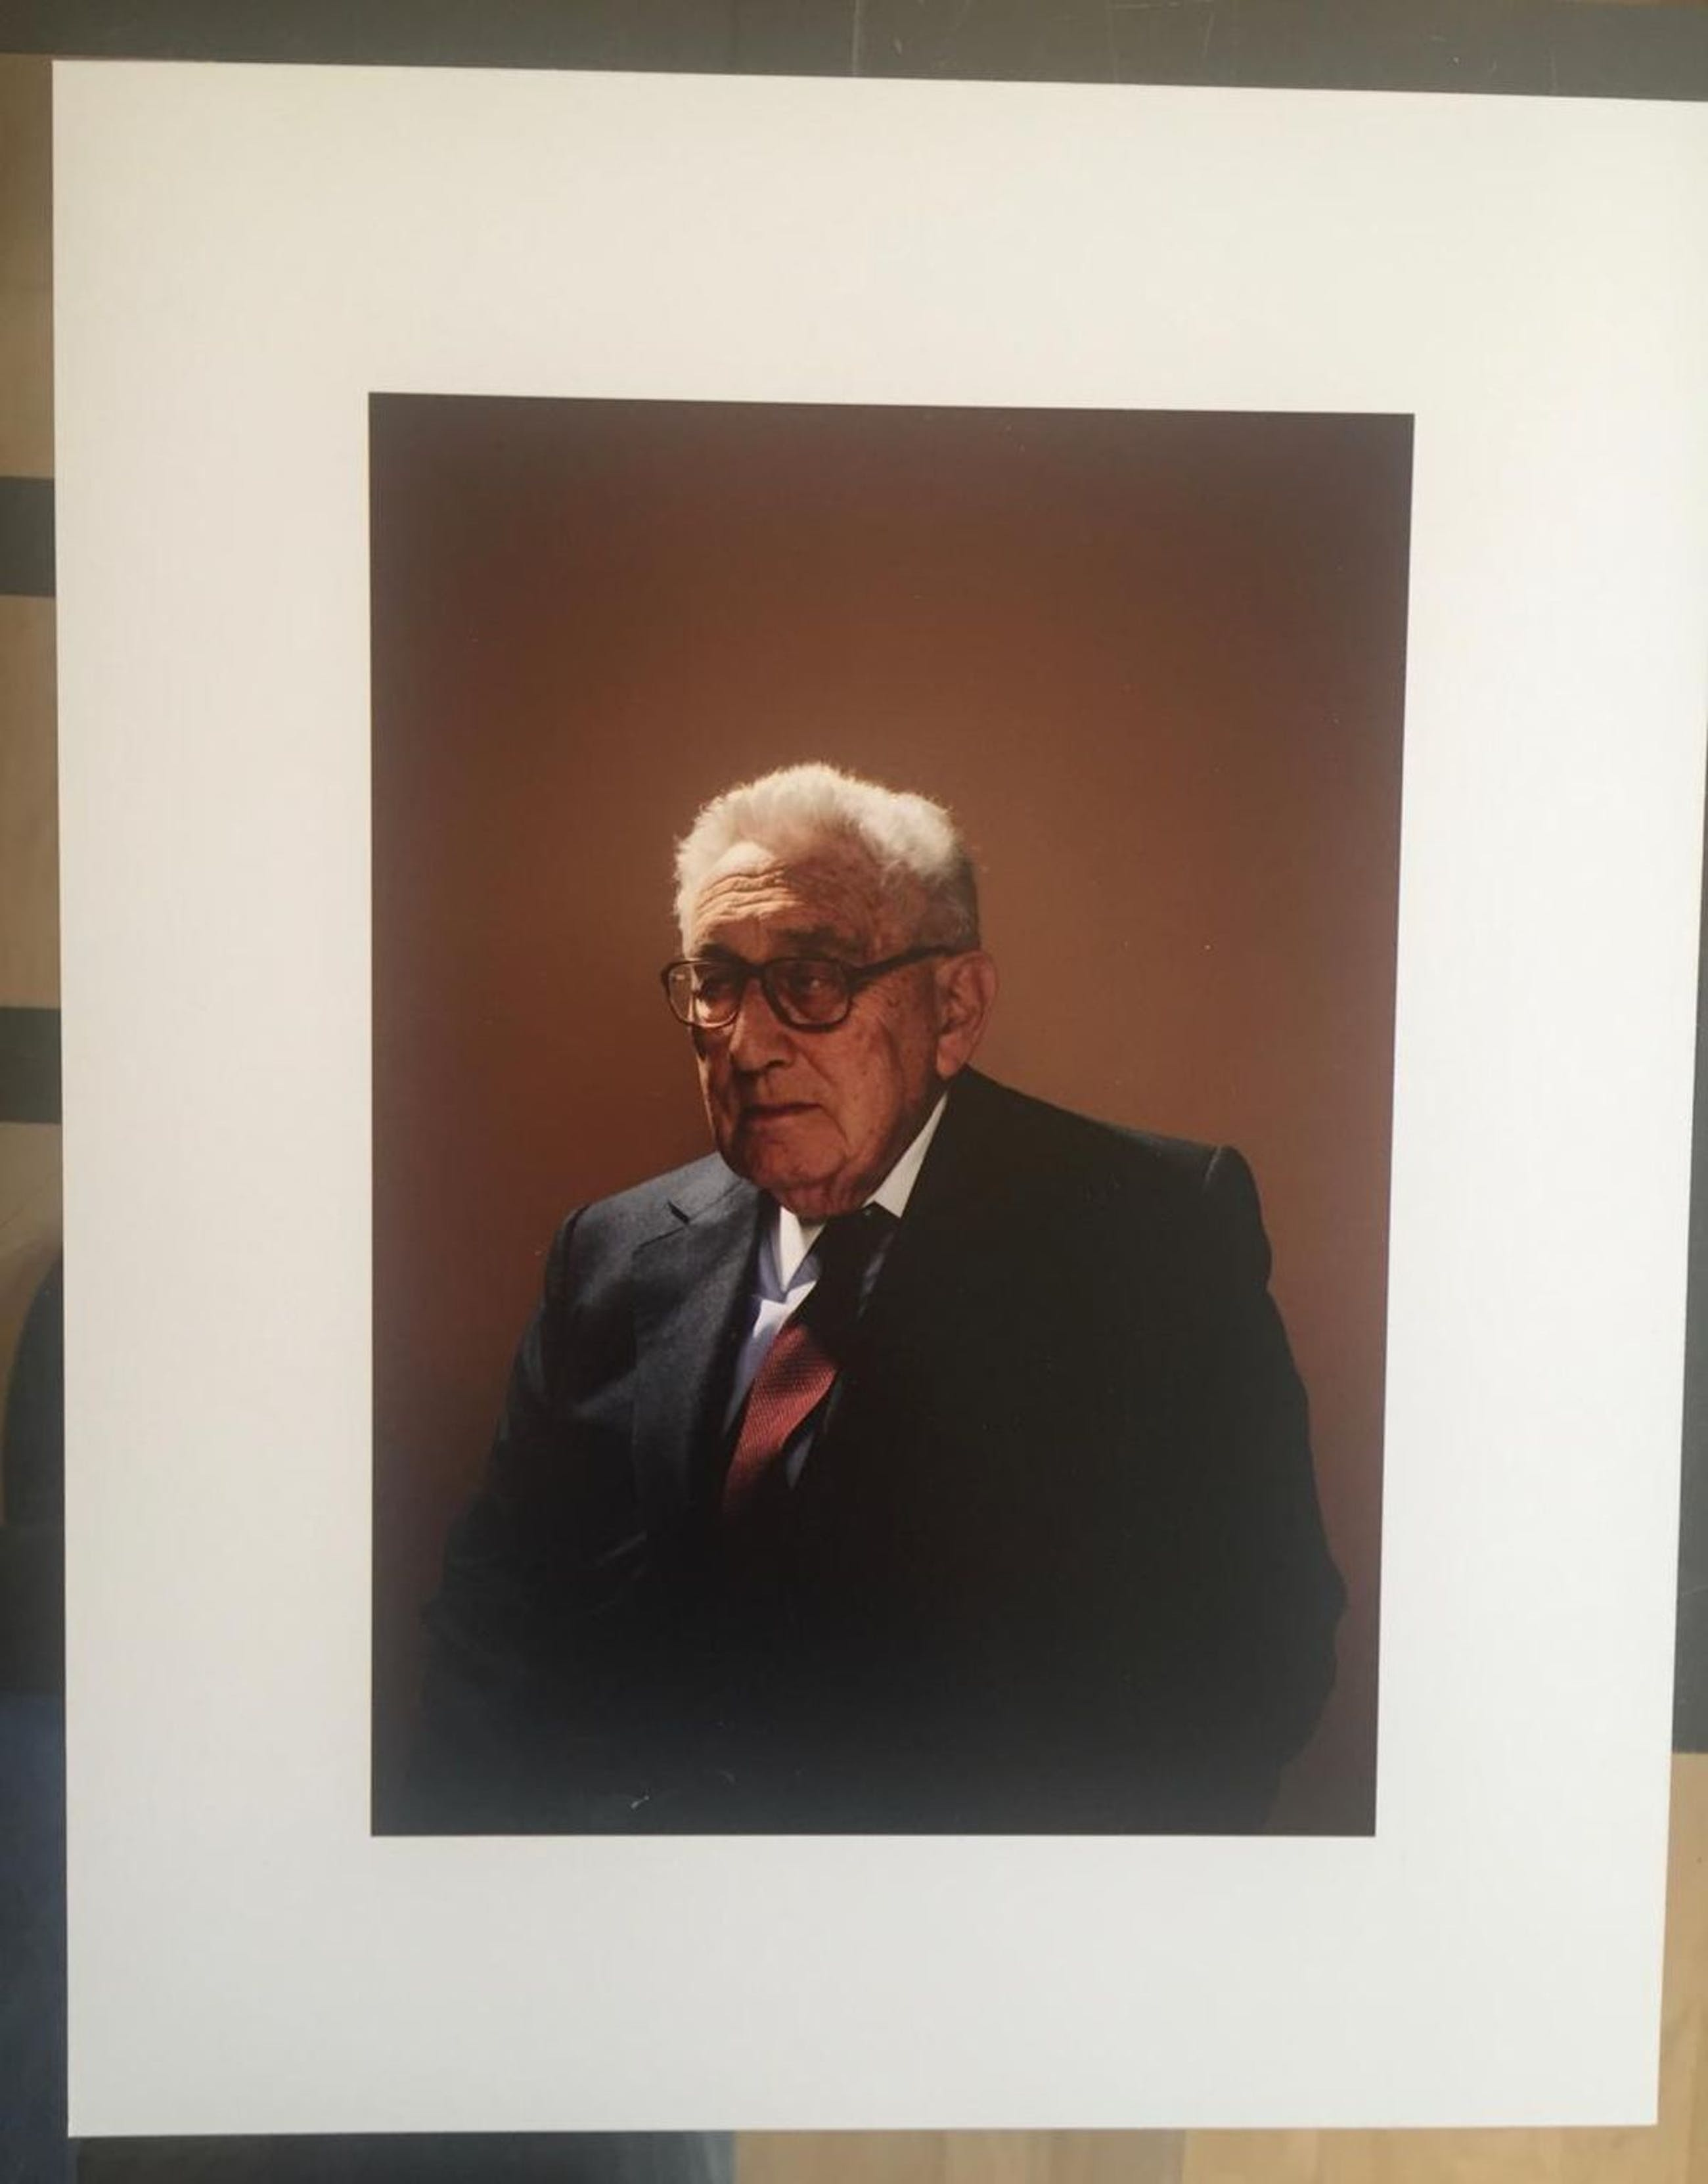 Taryn Simon - Motiv: Henry Kissinger, Geschenk des MMK, c-print kopen? Bied vanaf 1200!